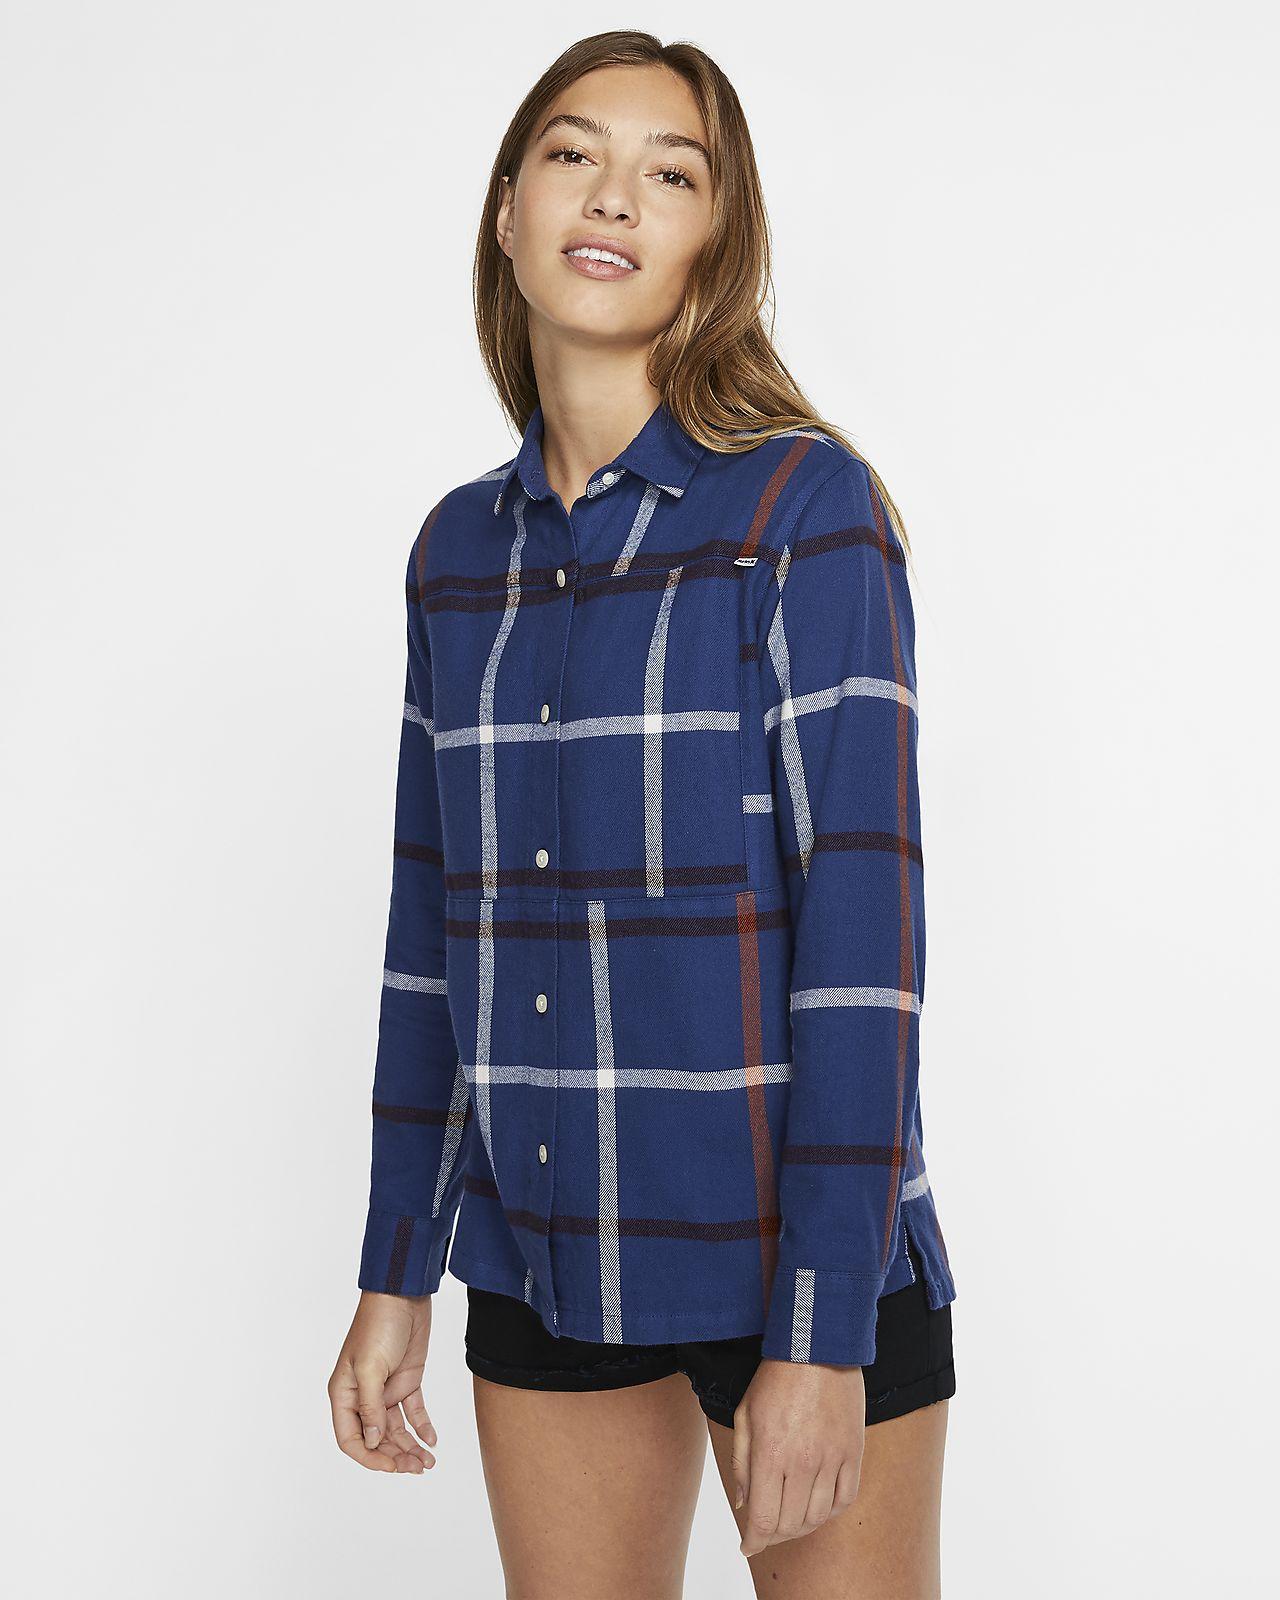 Hurley Wilson Flannel Women's Long-Sleeve Woven Top